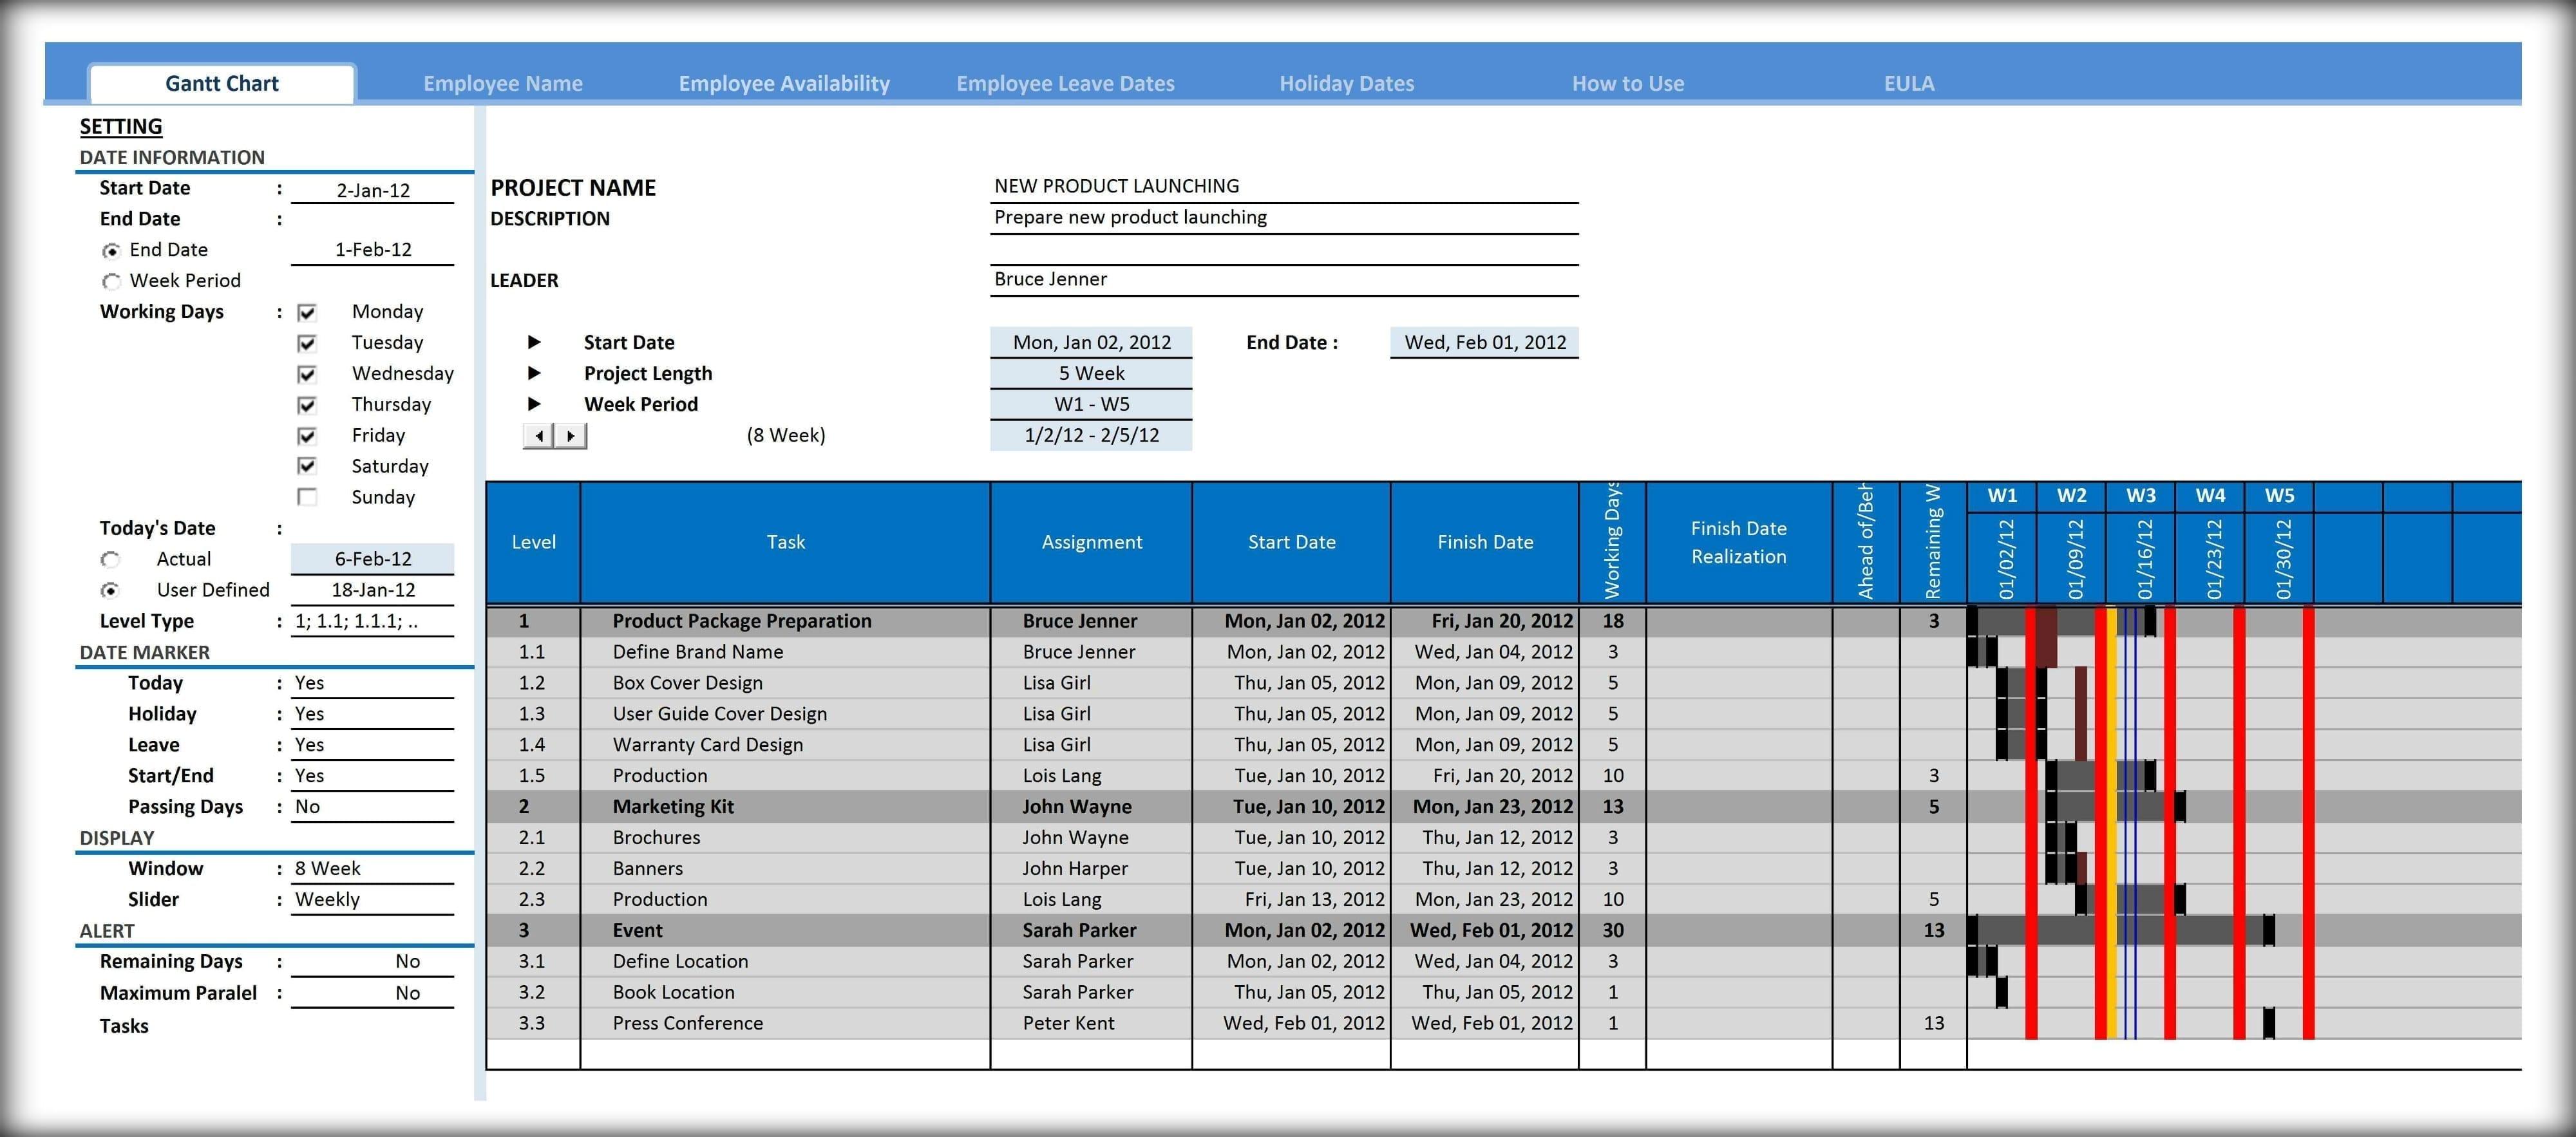 Excel 2010 Gantt Chart Template Excel Spreadsheet Gantt Chart Template Spreadsheet Templates for Busines Spreadsheet Templates for Busines Gantt Chart TEMPLATES